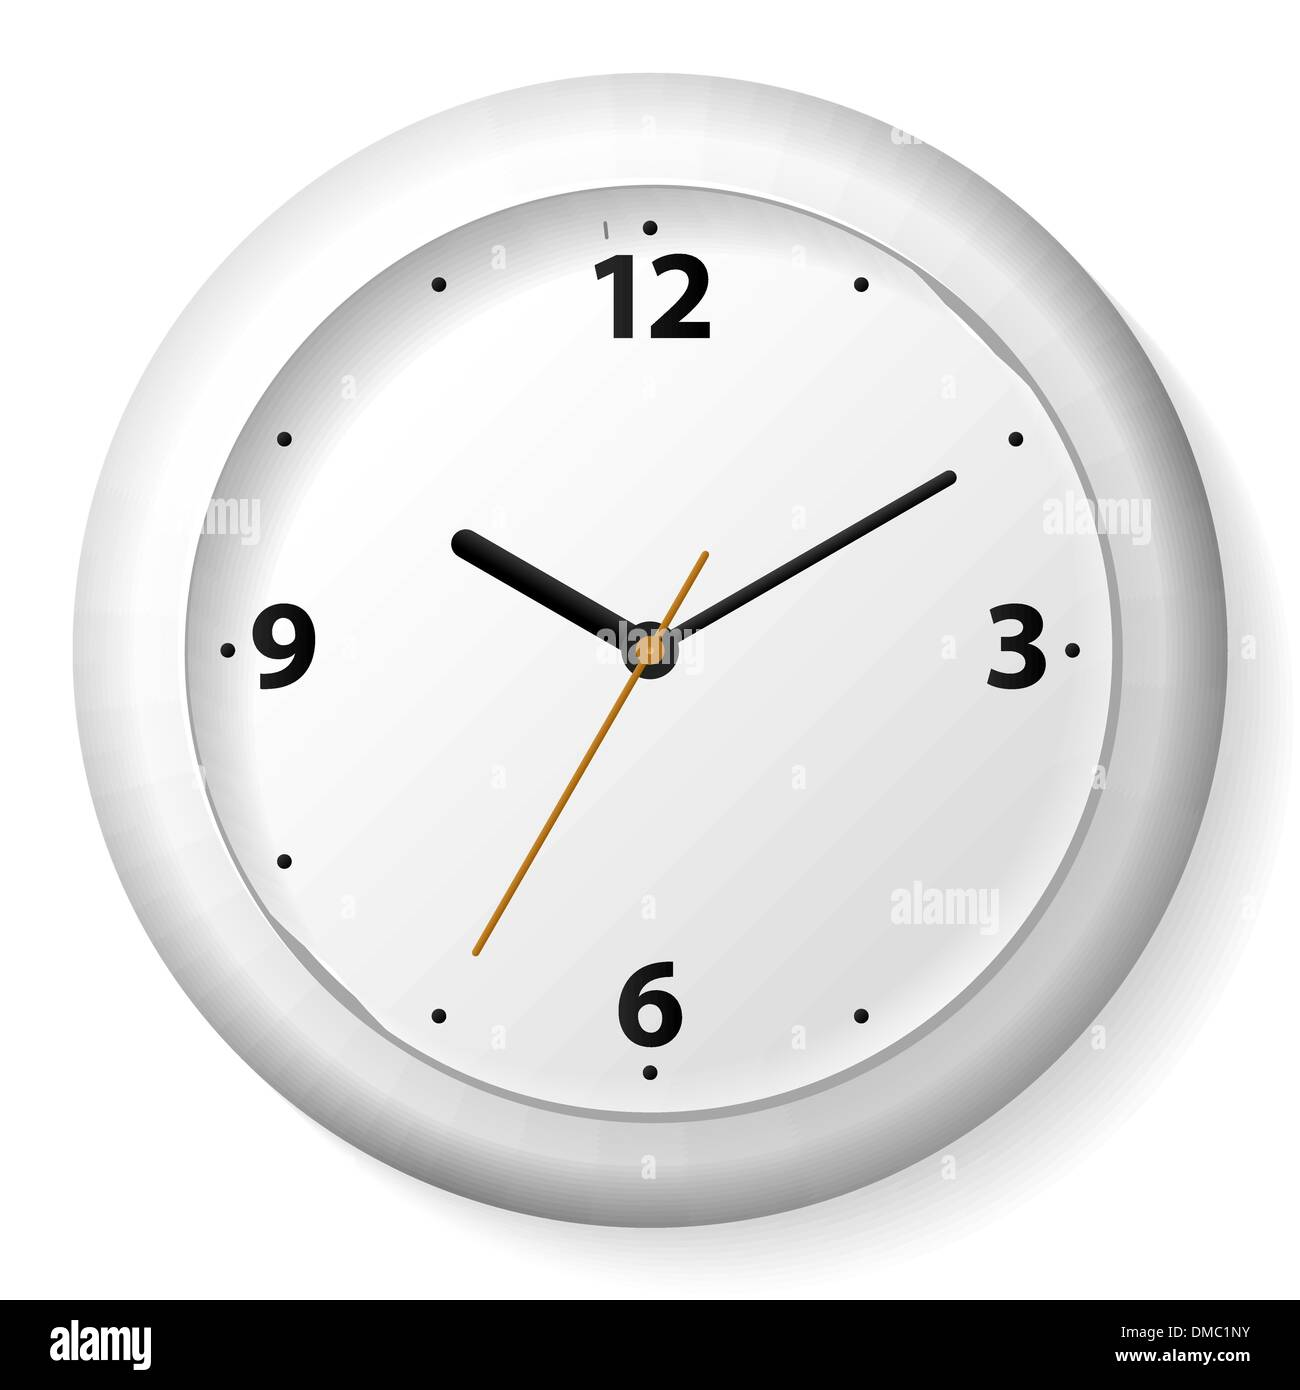 Vector clock on the wall stock vector art illustration vector vector clock on the wall amipublicfo Gallery